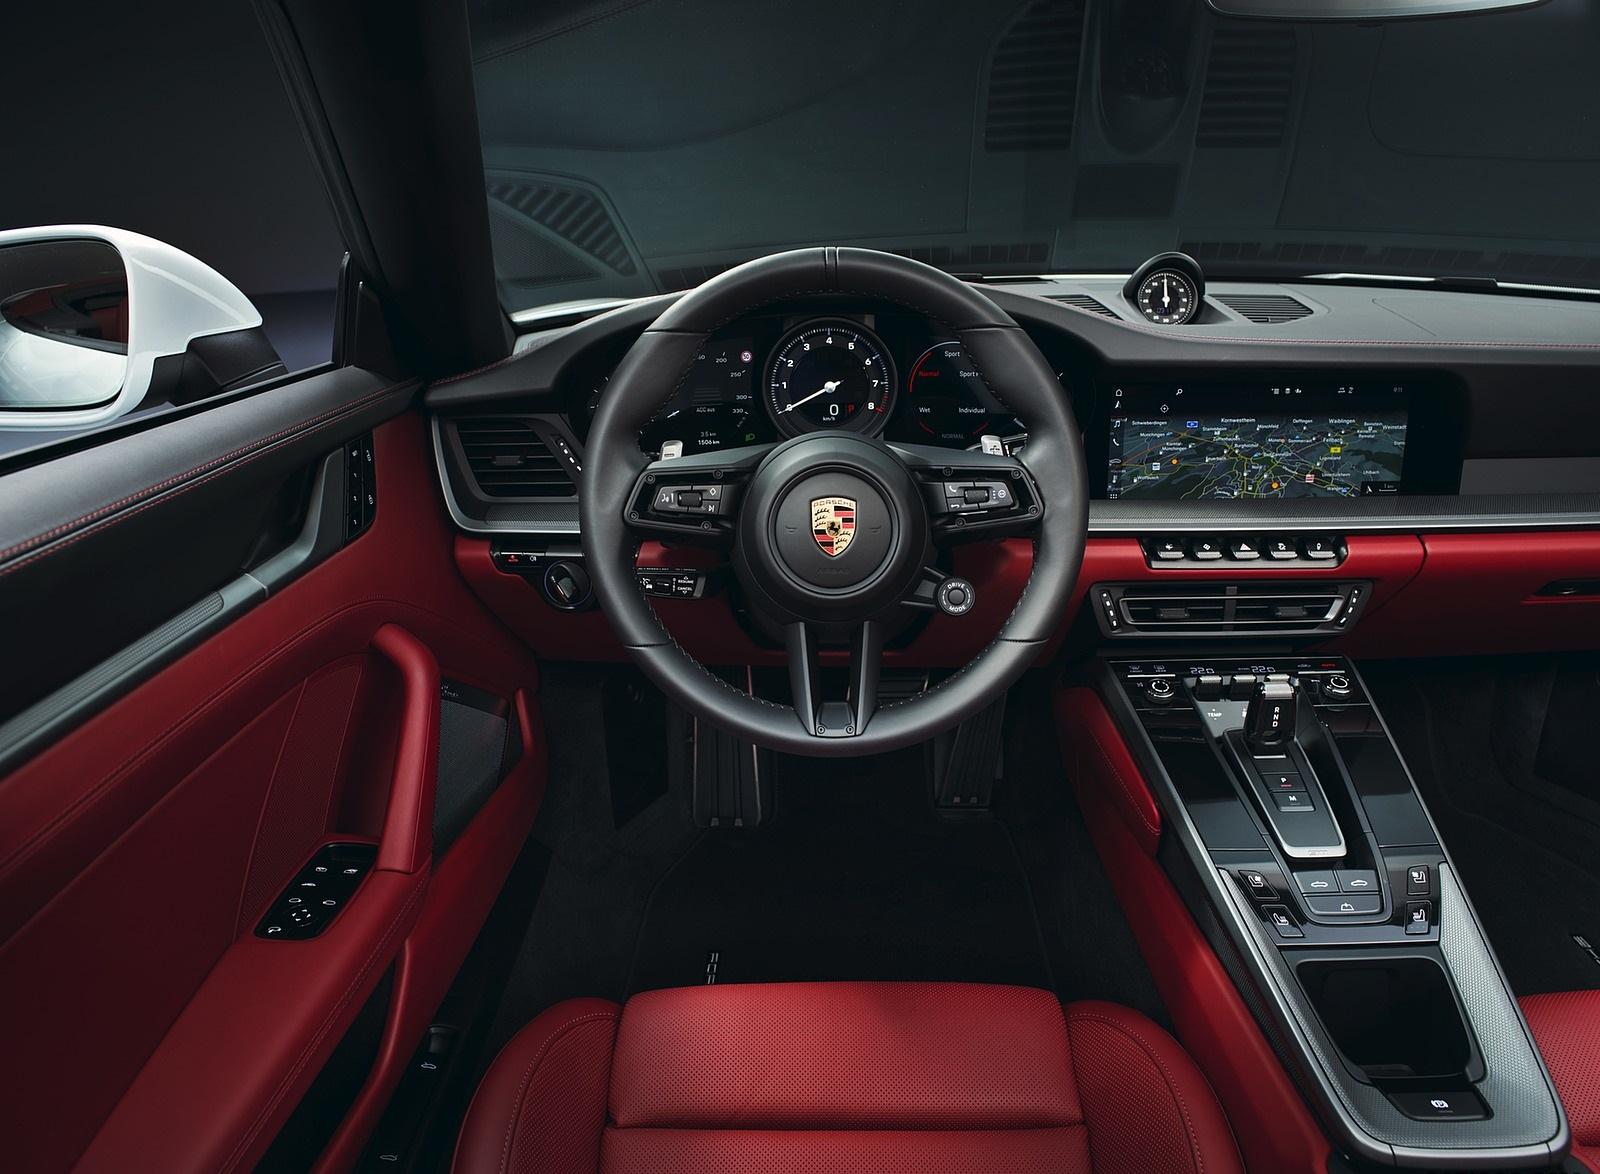 2020 Porsche 911 Carrera Cabriolet Interior Cockpit Wallpapers 59 1600x1174